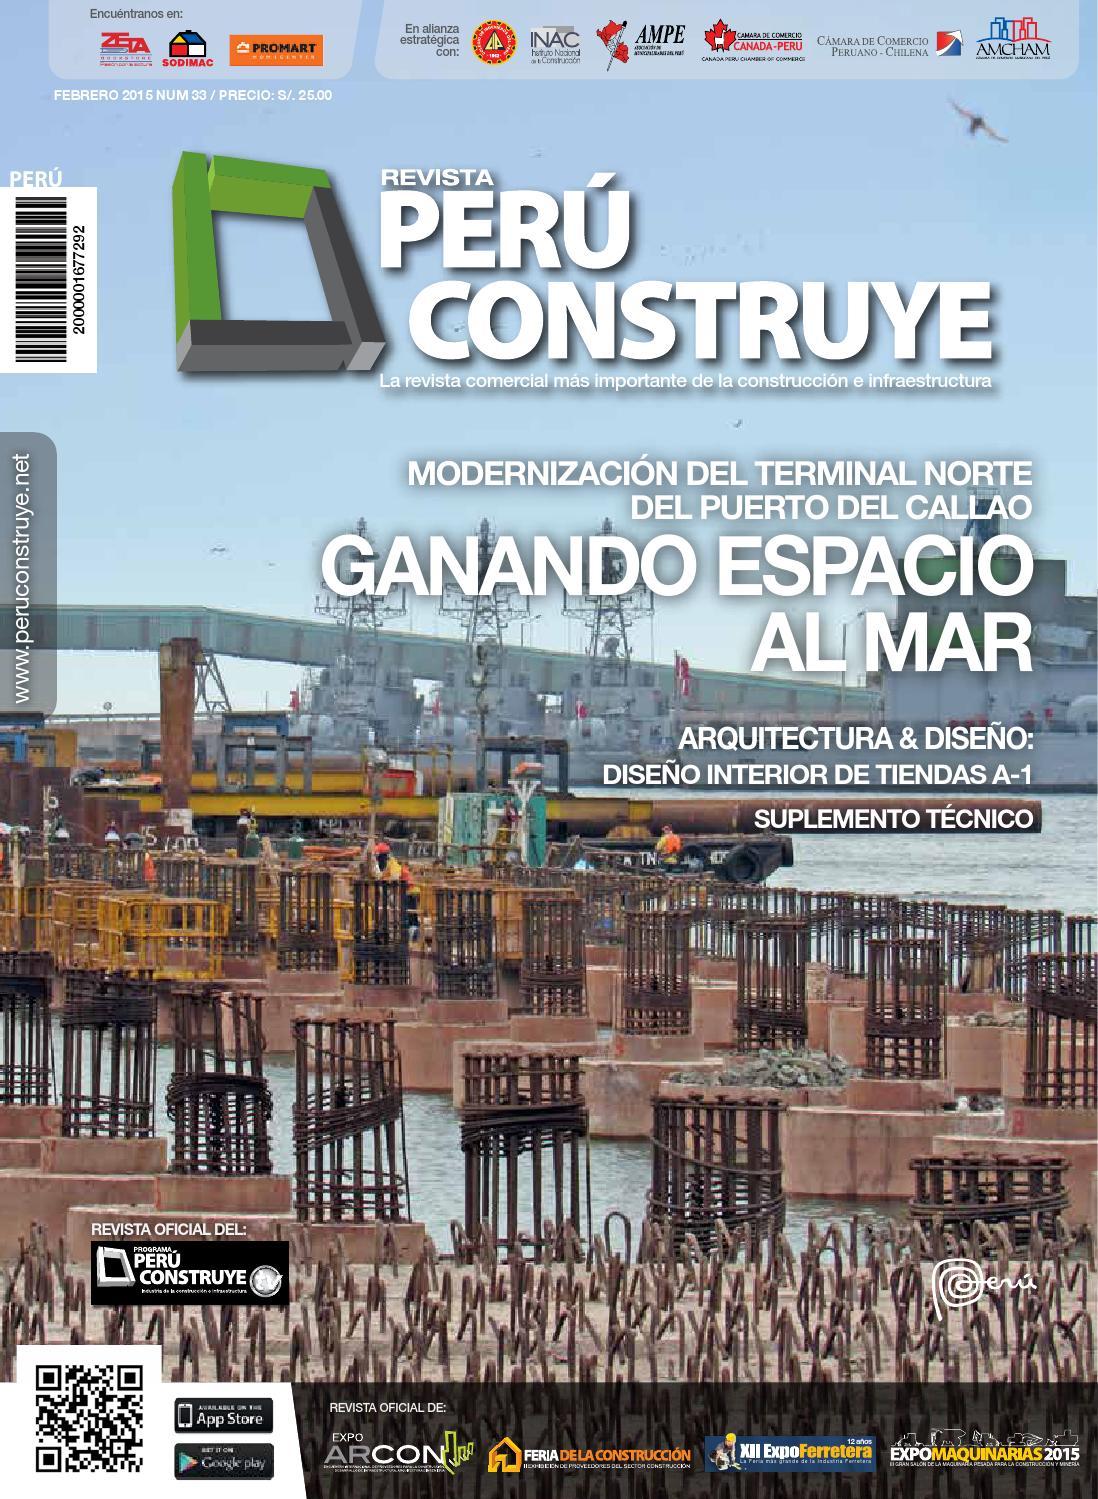 ISSUU - REVISTA PERÚ CONSTRUYE ED. 33 by Grupo Digamma